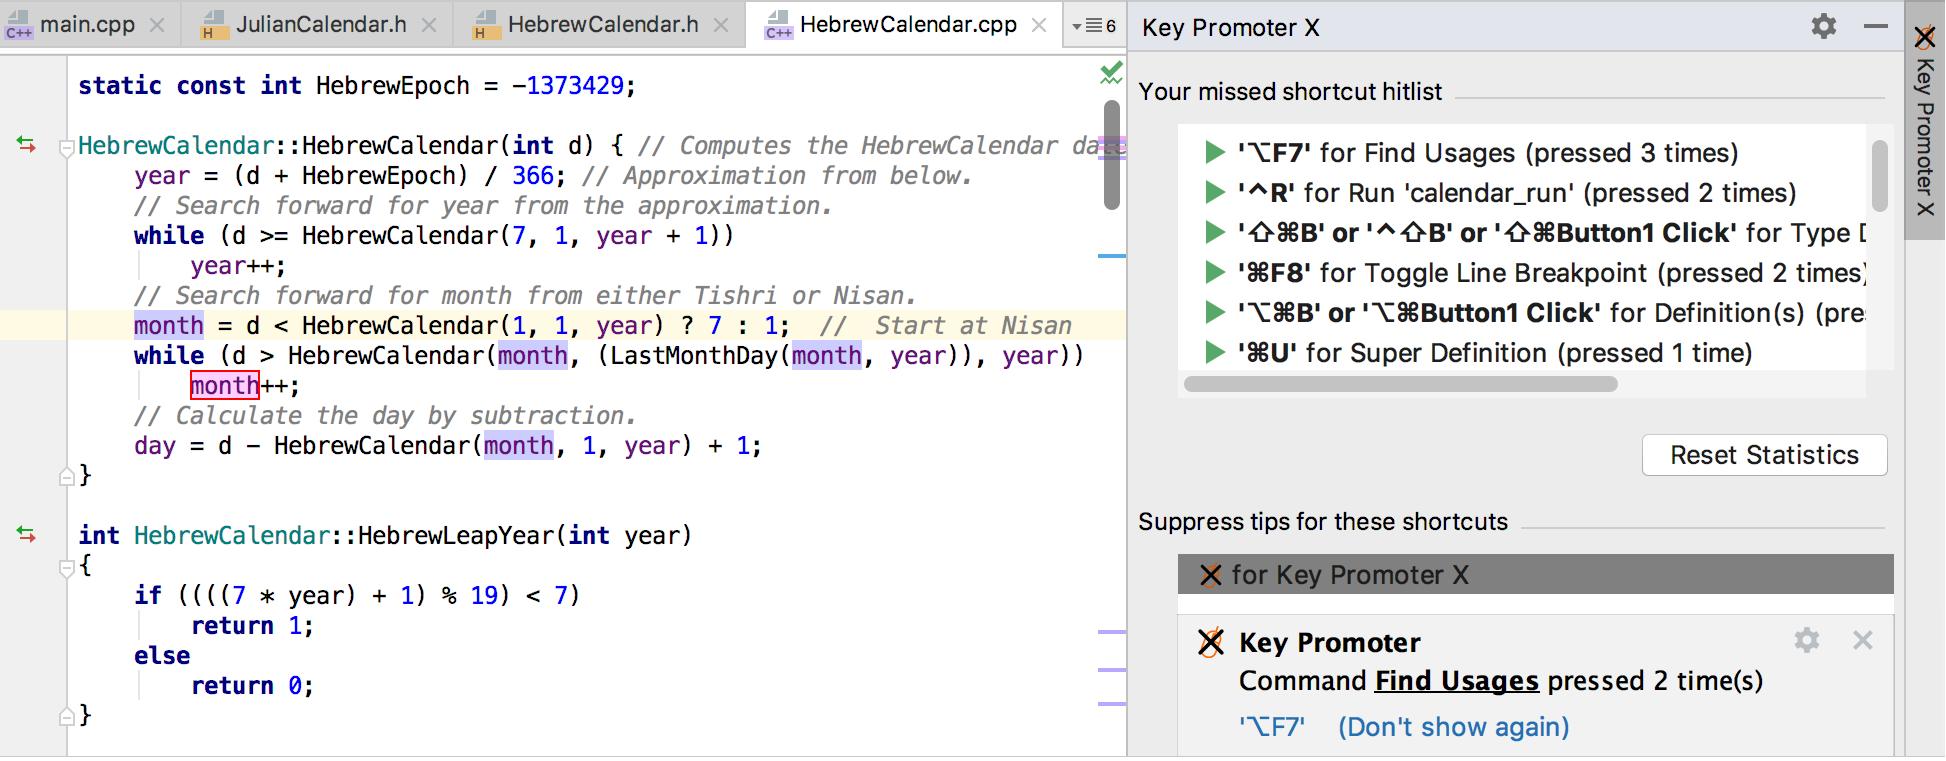 key promoter x plugin